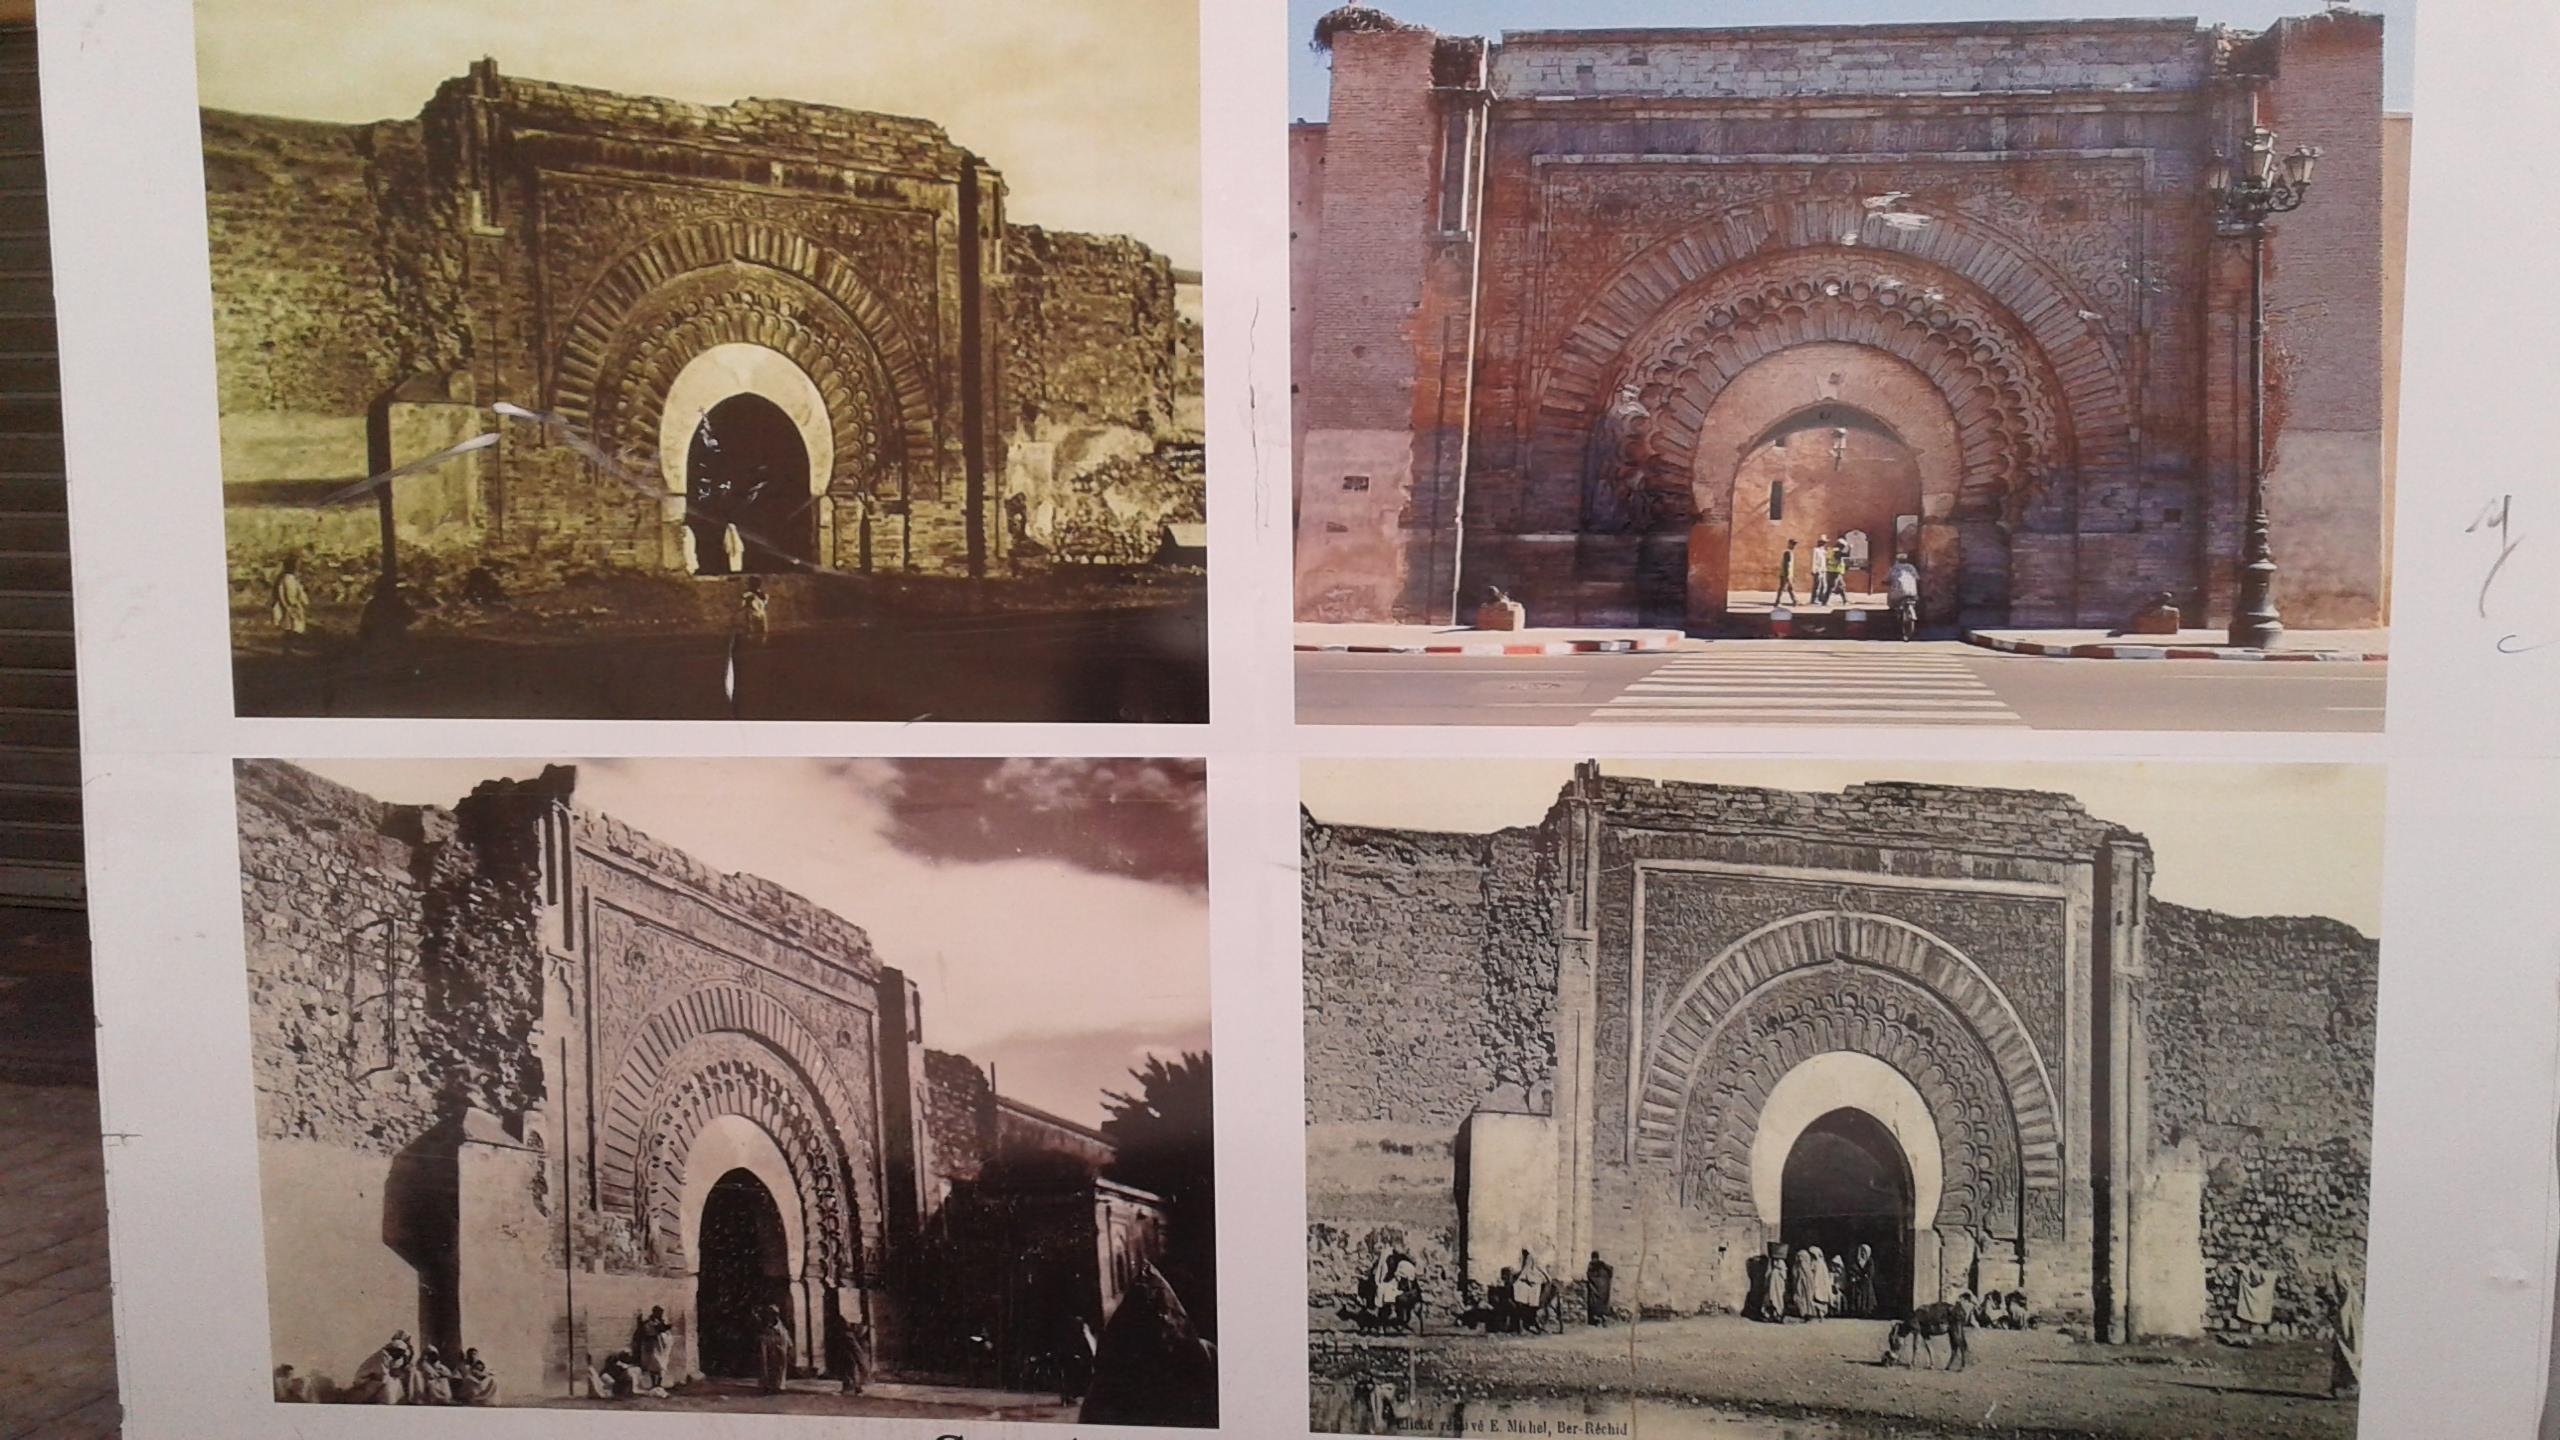 Bab Agnaou Marrakech -Travaux de Renovation works 2020